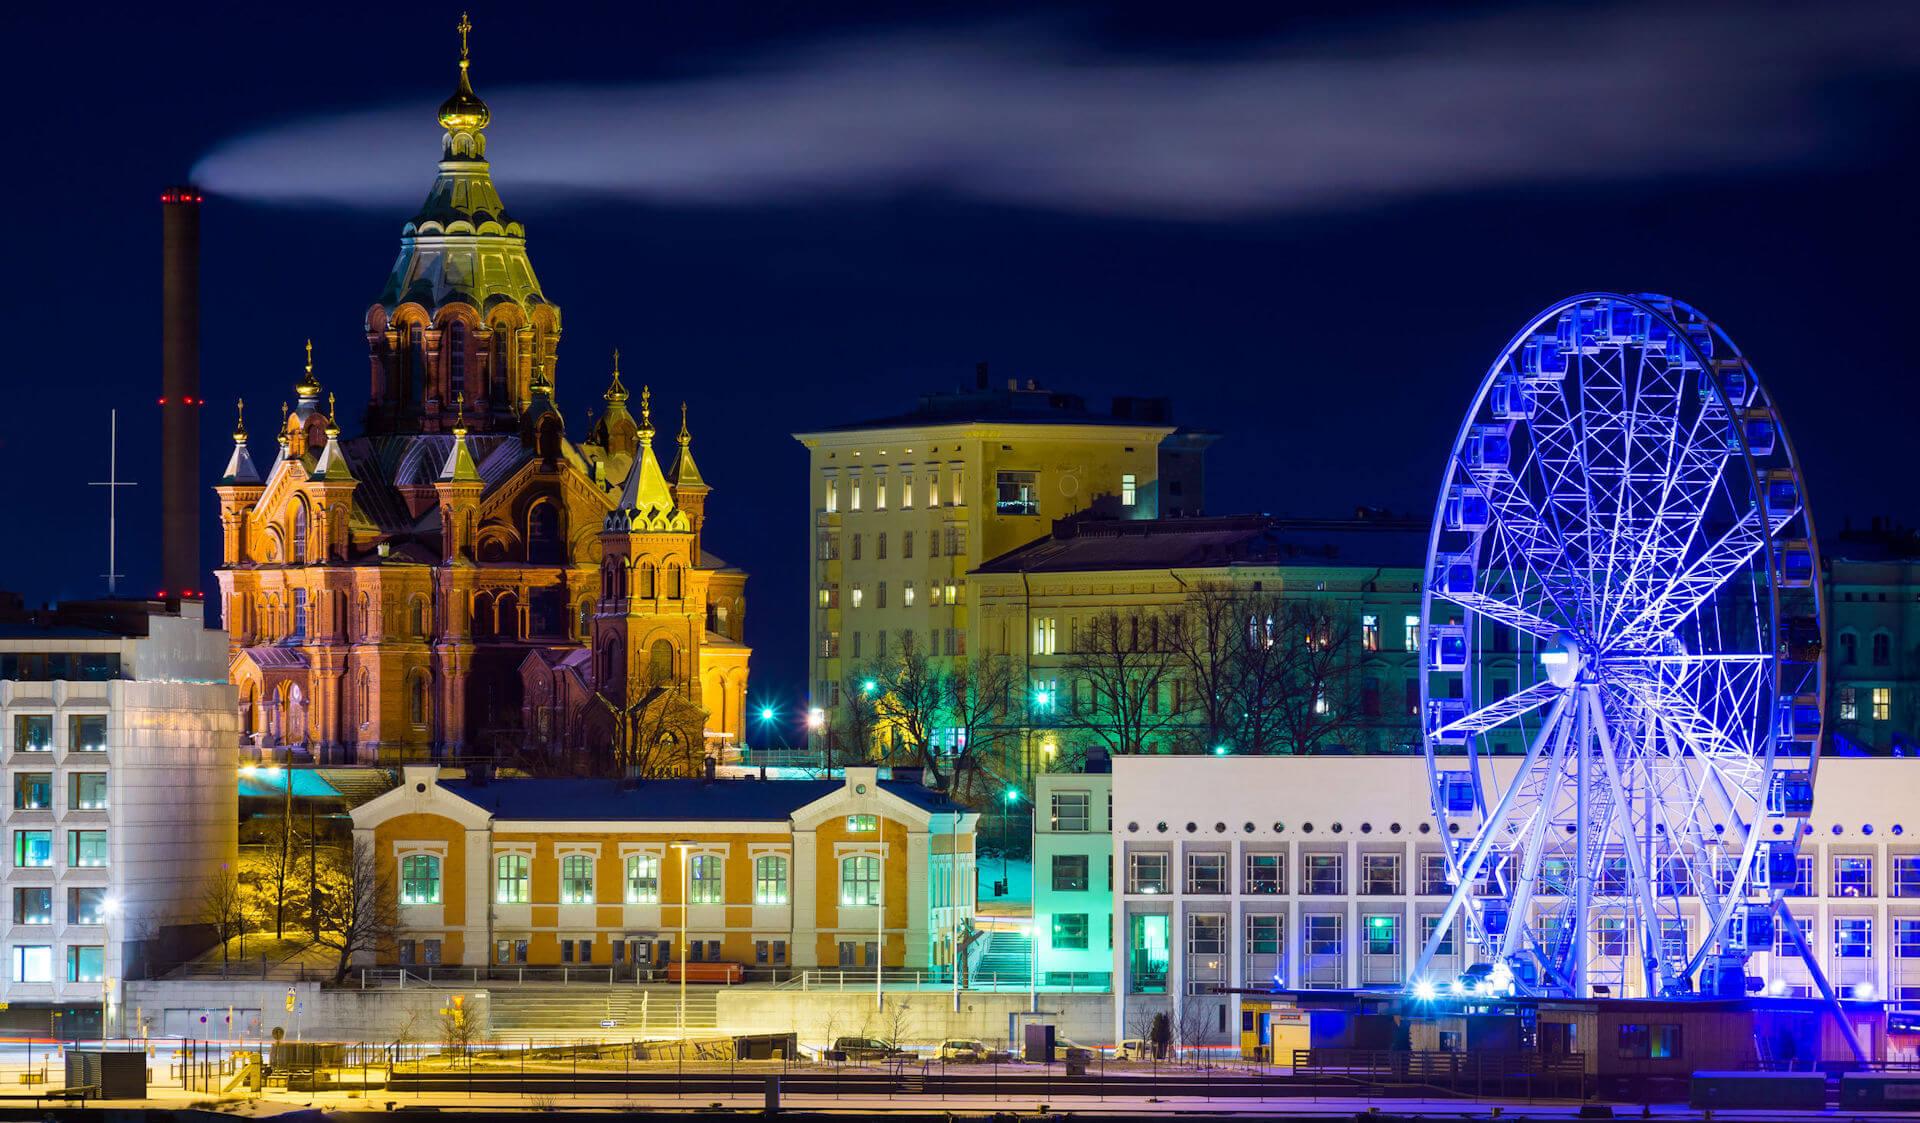 •25-29 November 2019 - Helsinki, Finland